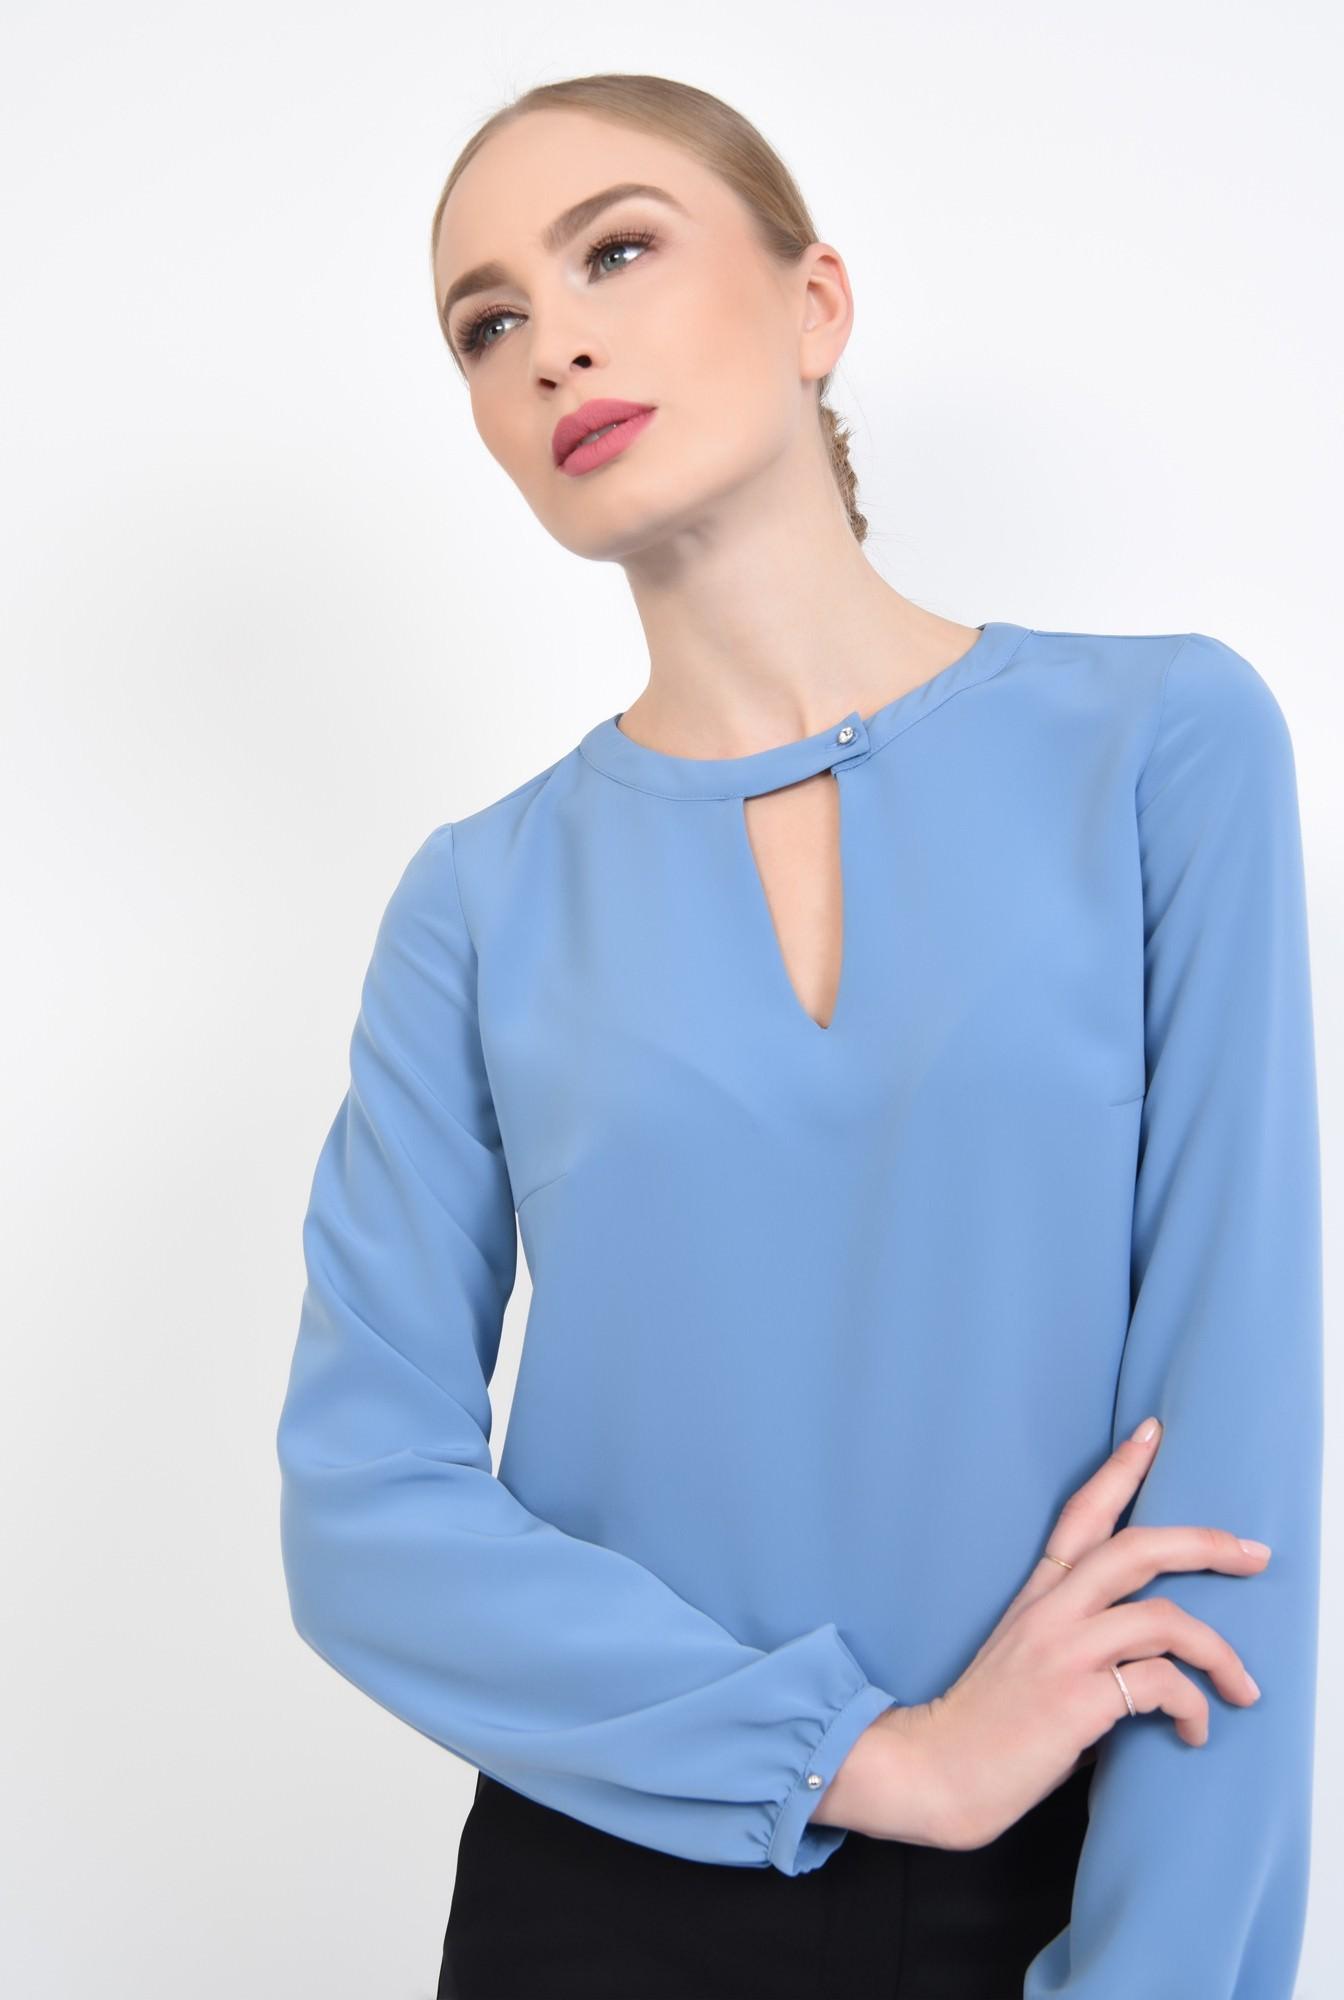 2 - 360 - Bluza casual, bleu, maneci lungi